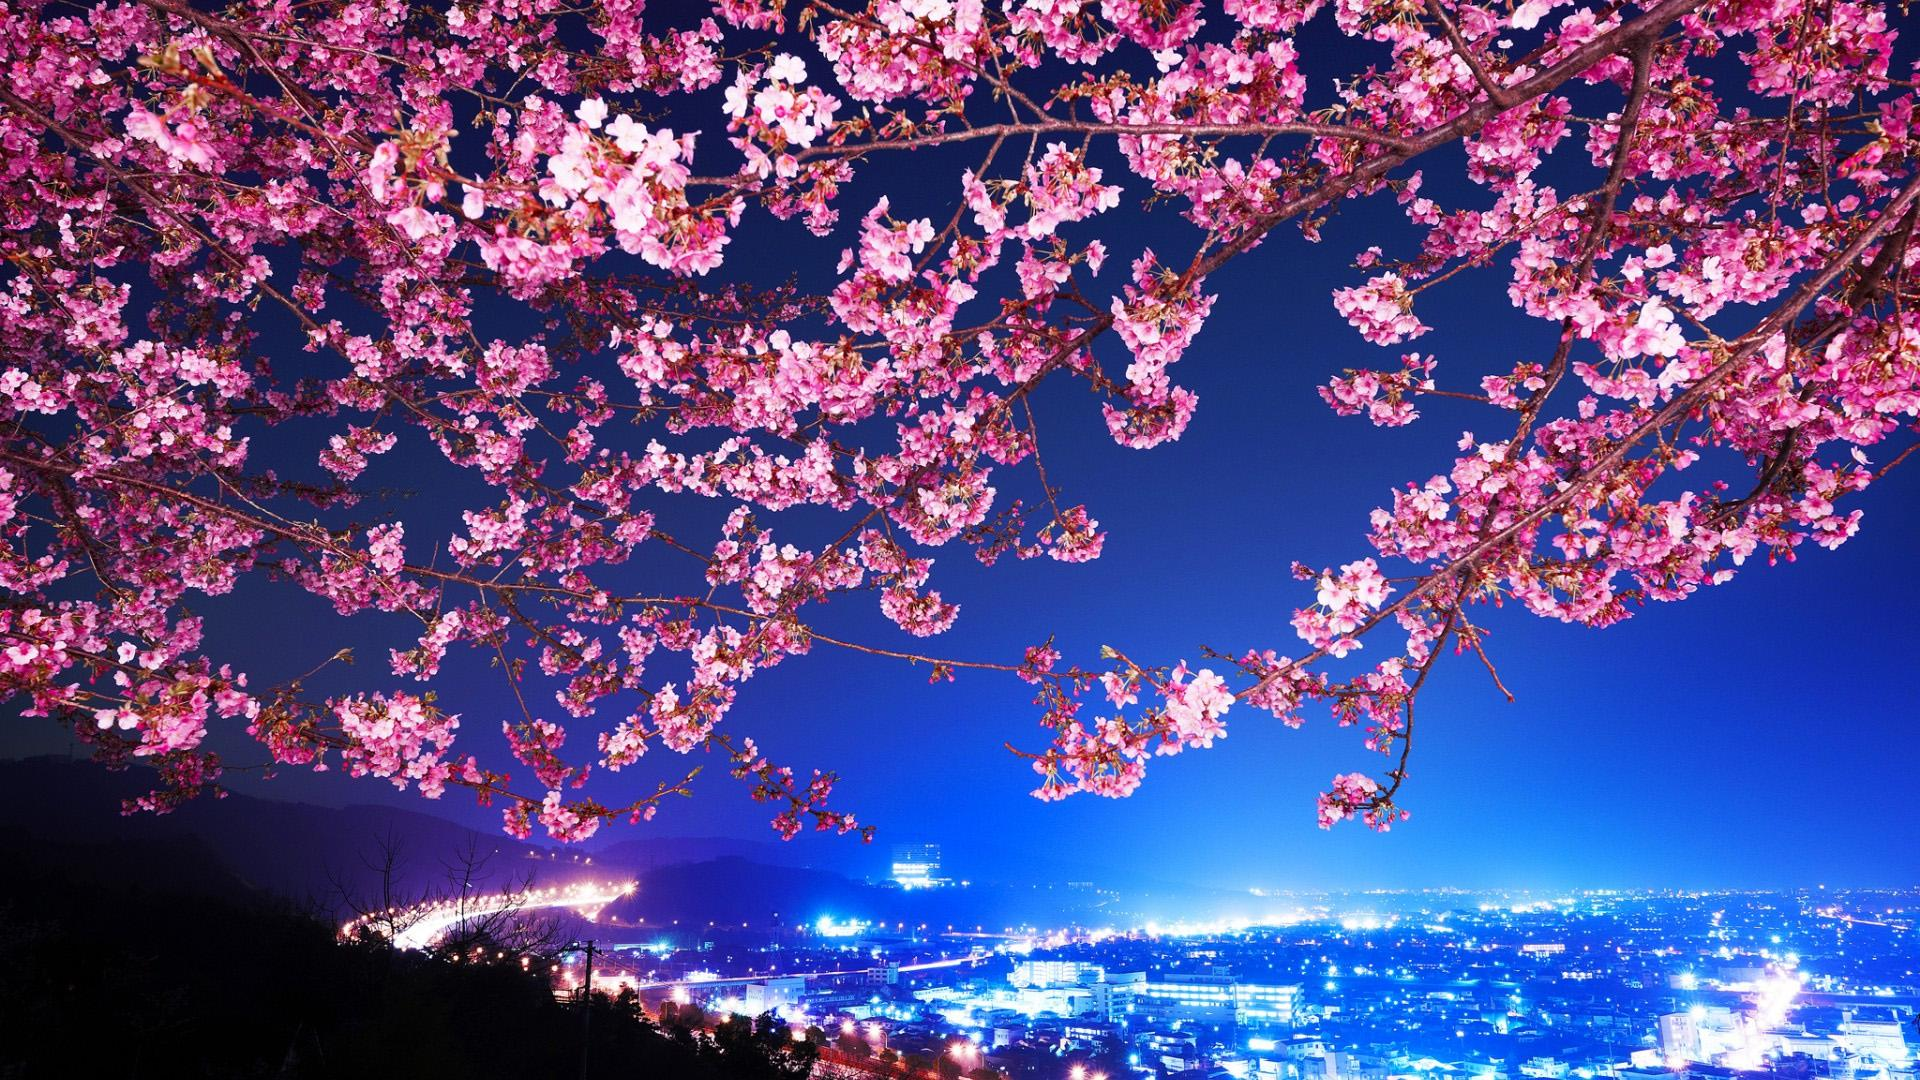 Inilah Jalan Terang Menuju Negeri Bunga Sakura